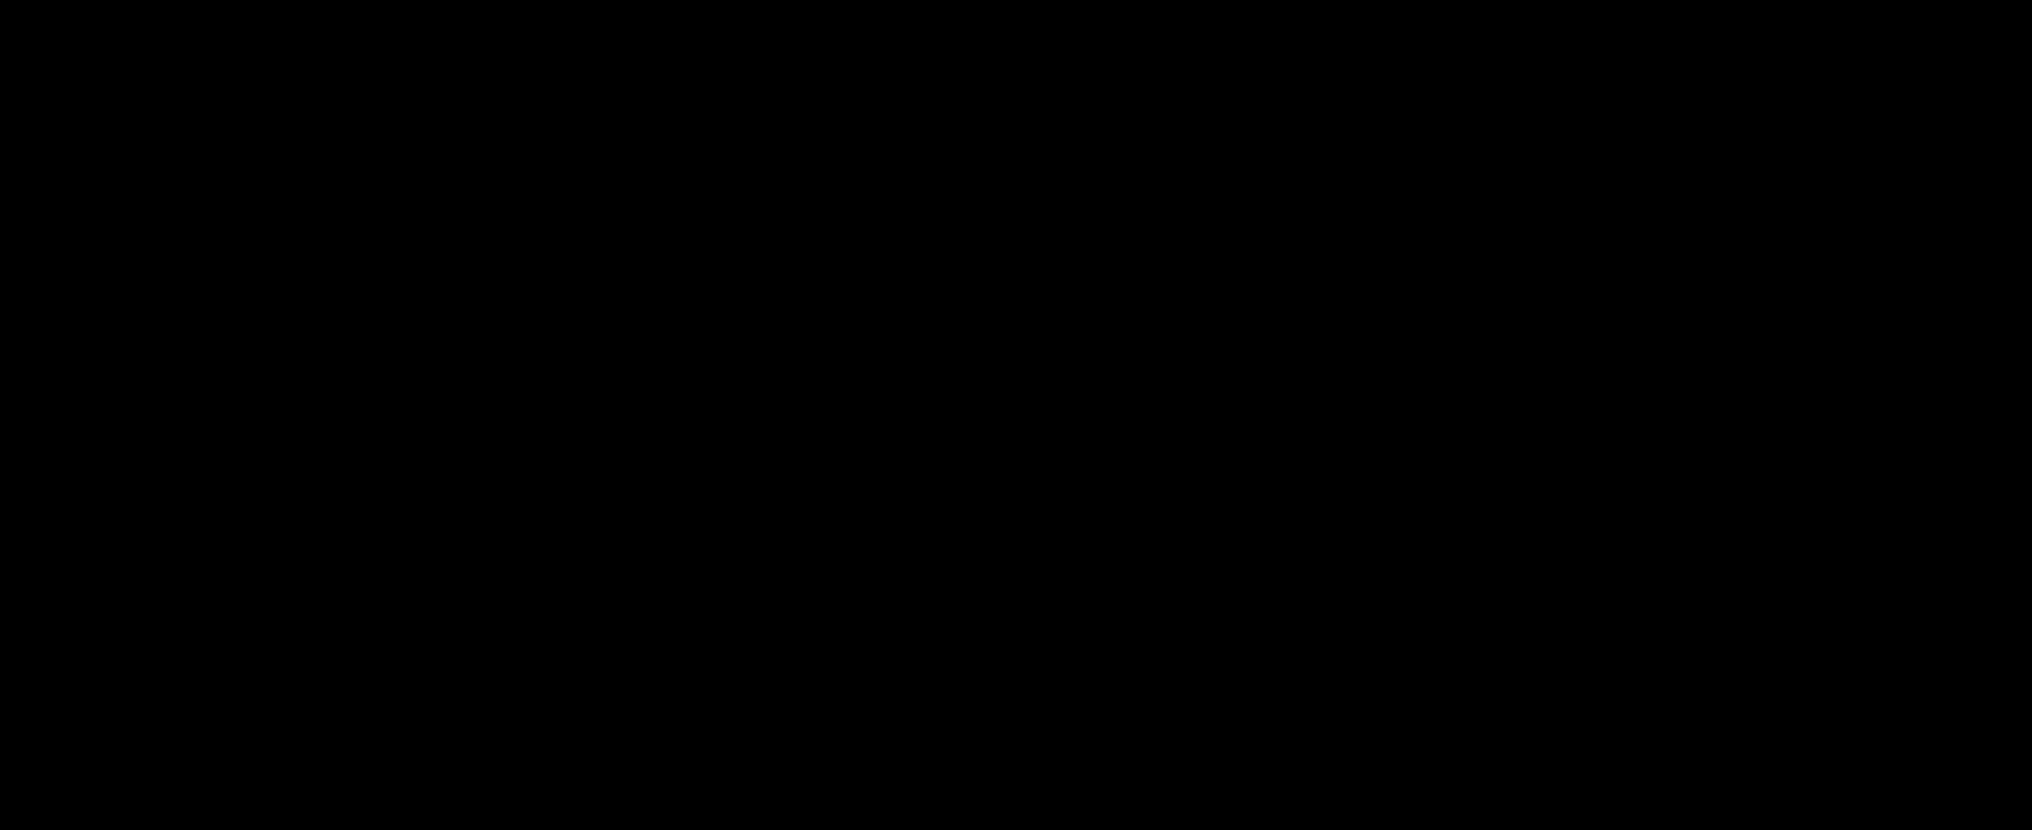 (±)-Carvedilol-d<sub>4 </sub>(ethyl-d<sub>4</sub>)